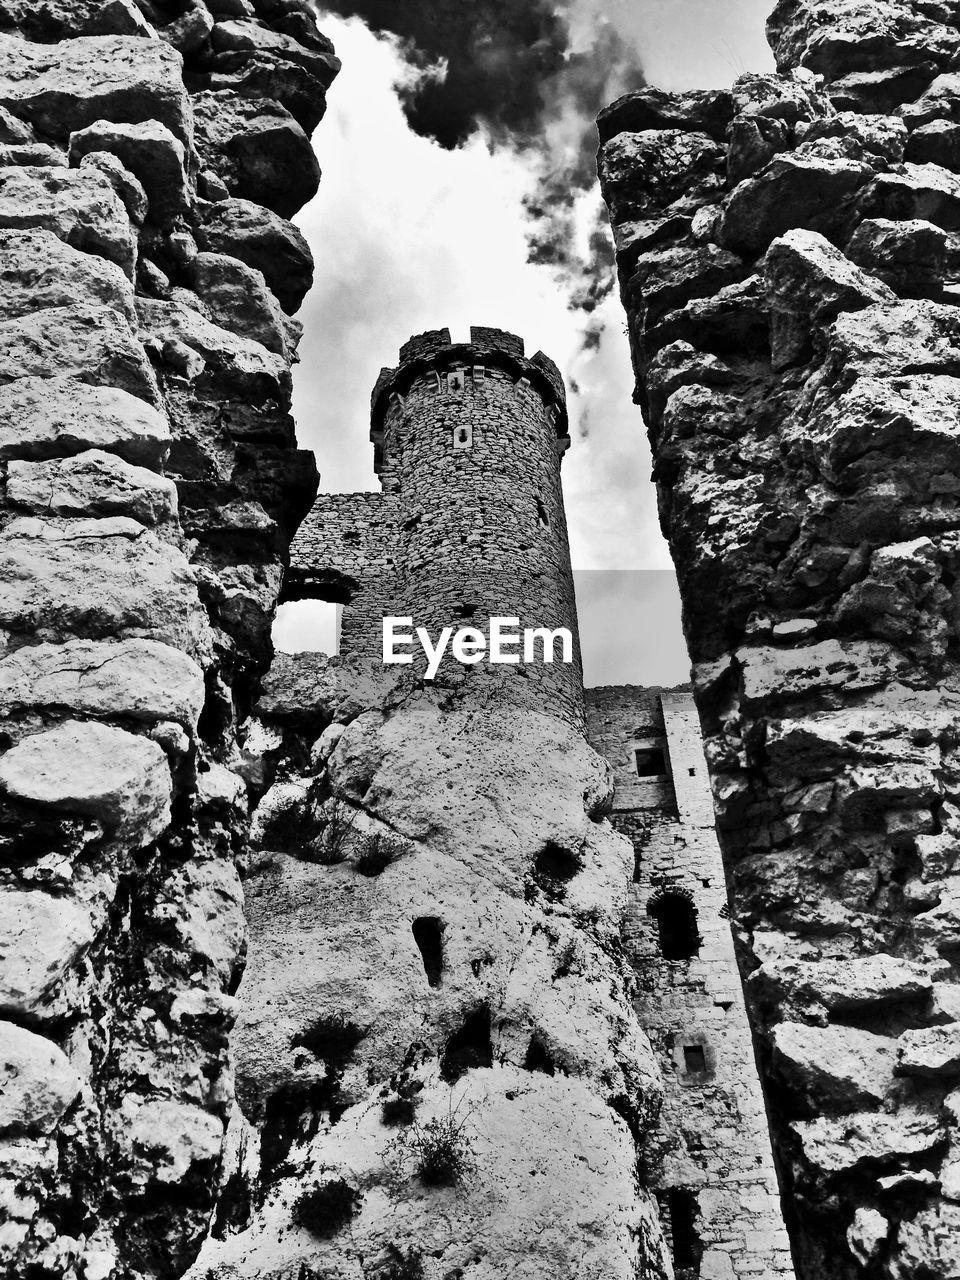 Low angle view of ogrodzieniec castle